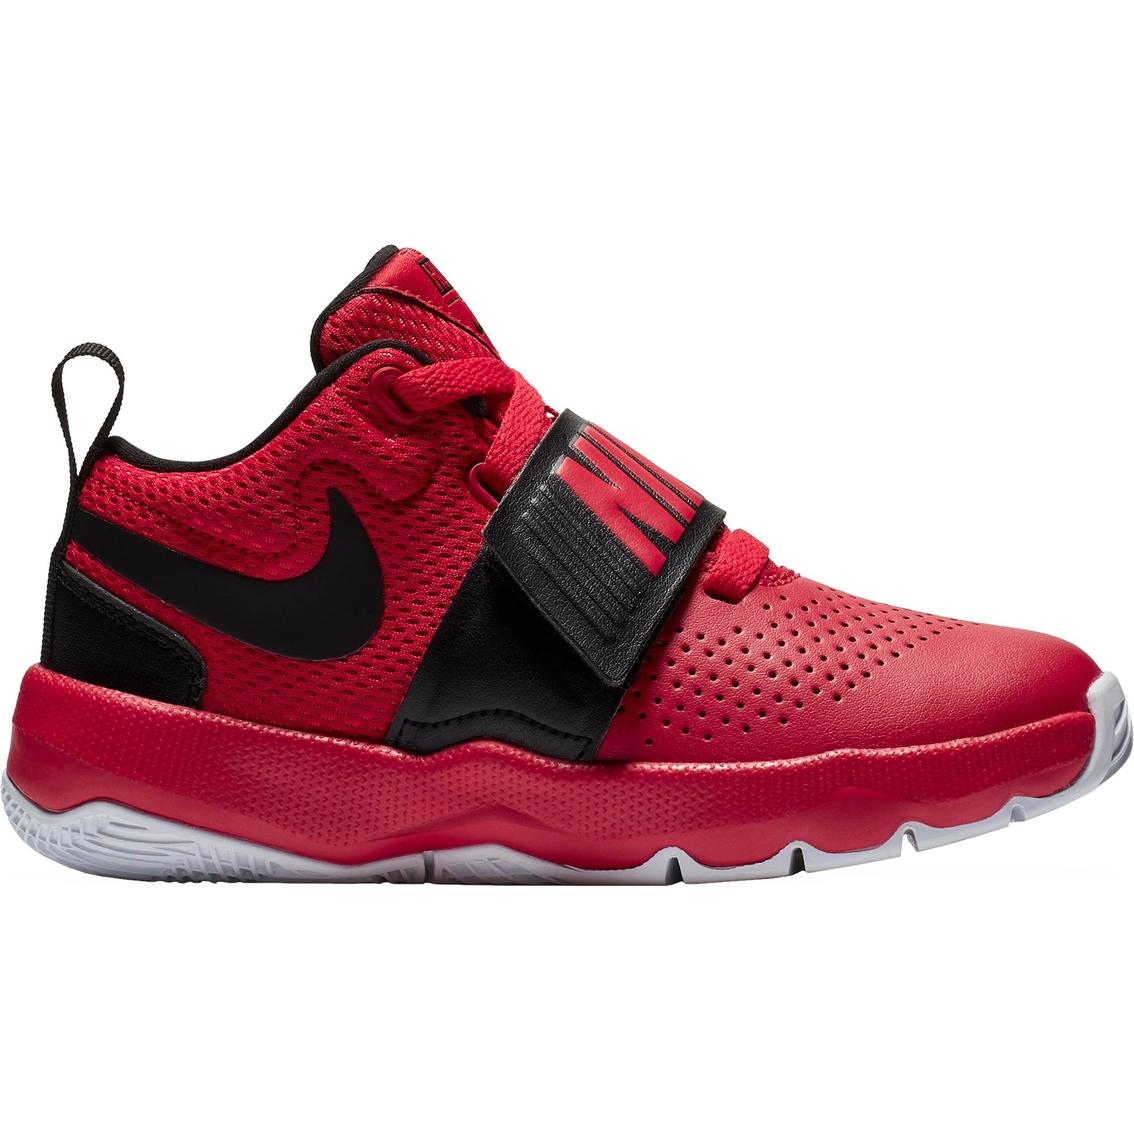 best website 32231 51266 Nike Preschool Boys Team Hustle D 8 Basketball Shoes